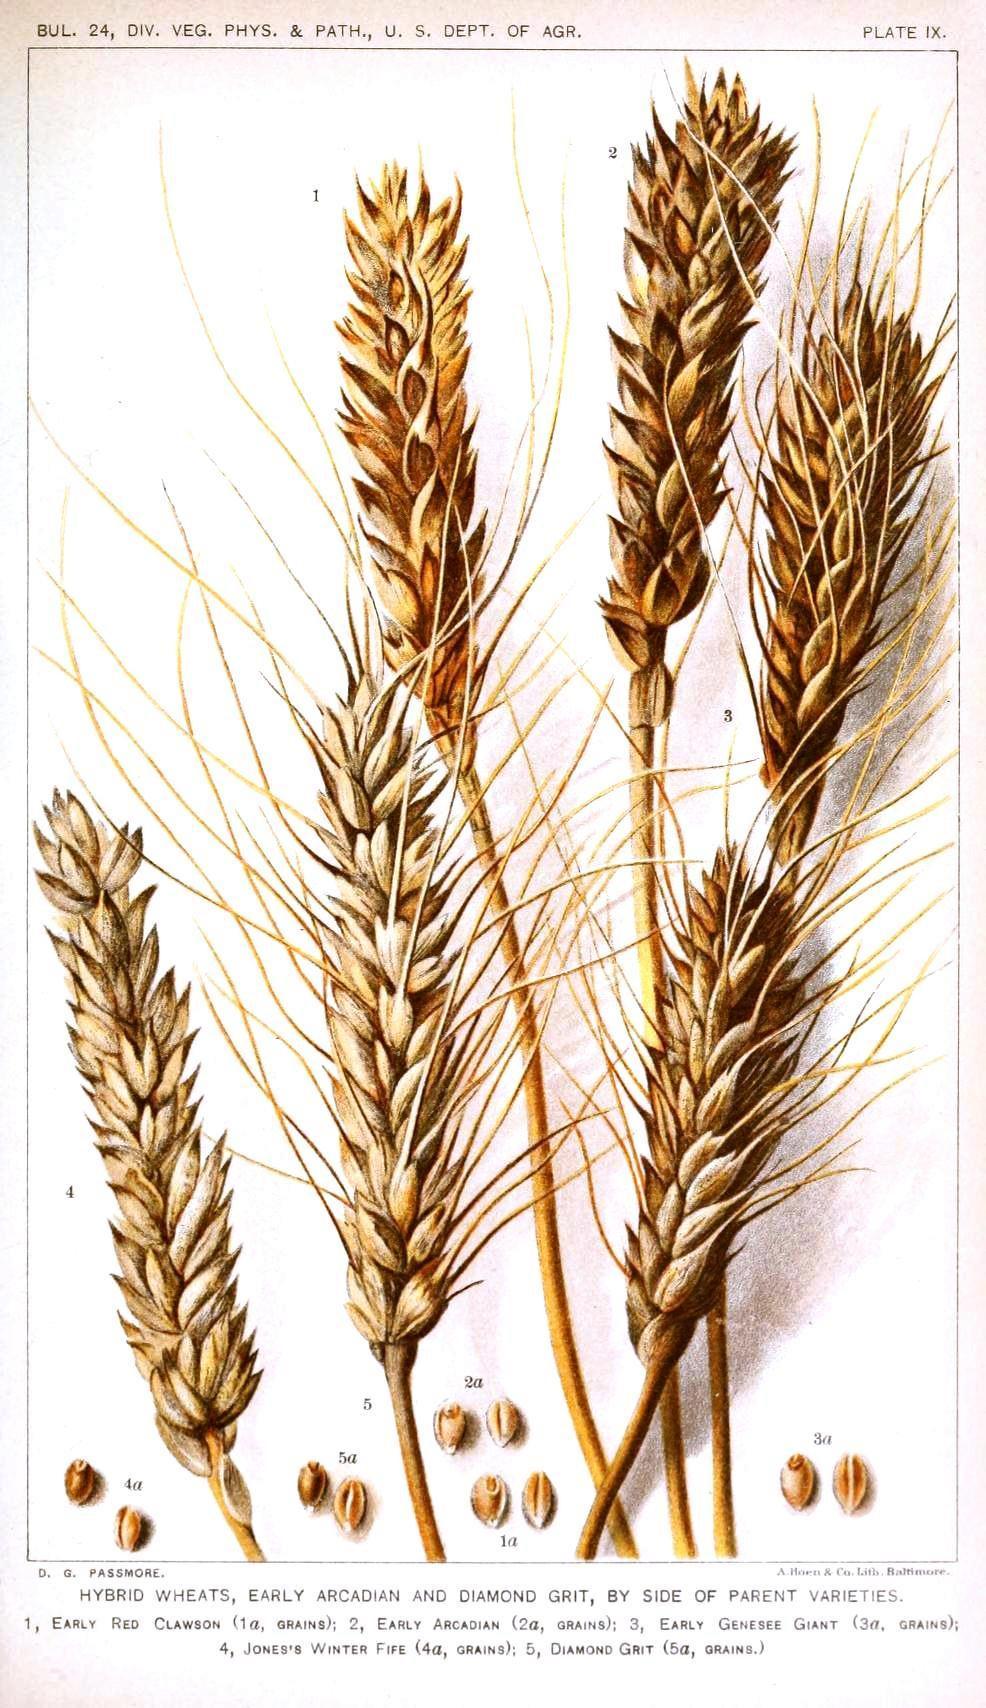 Drawn wheat Plants Pinterest varieties drawing Botanical